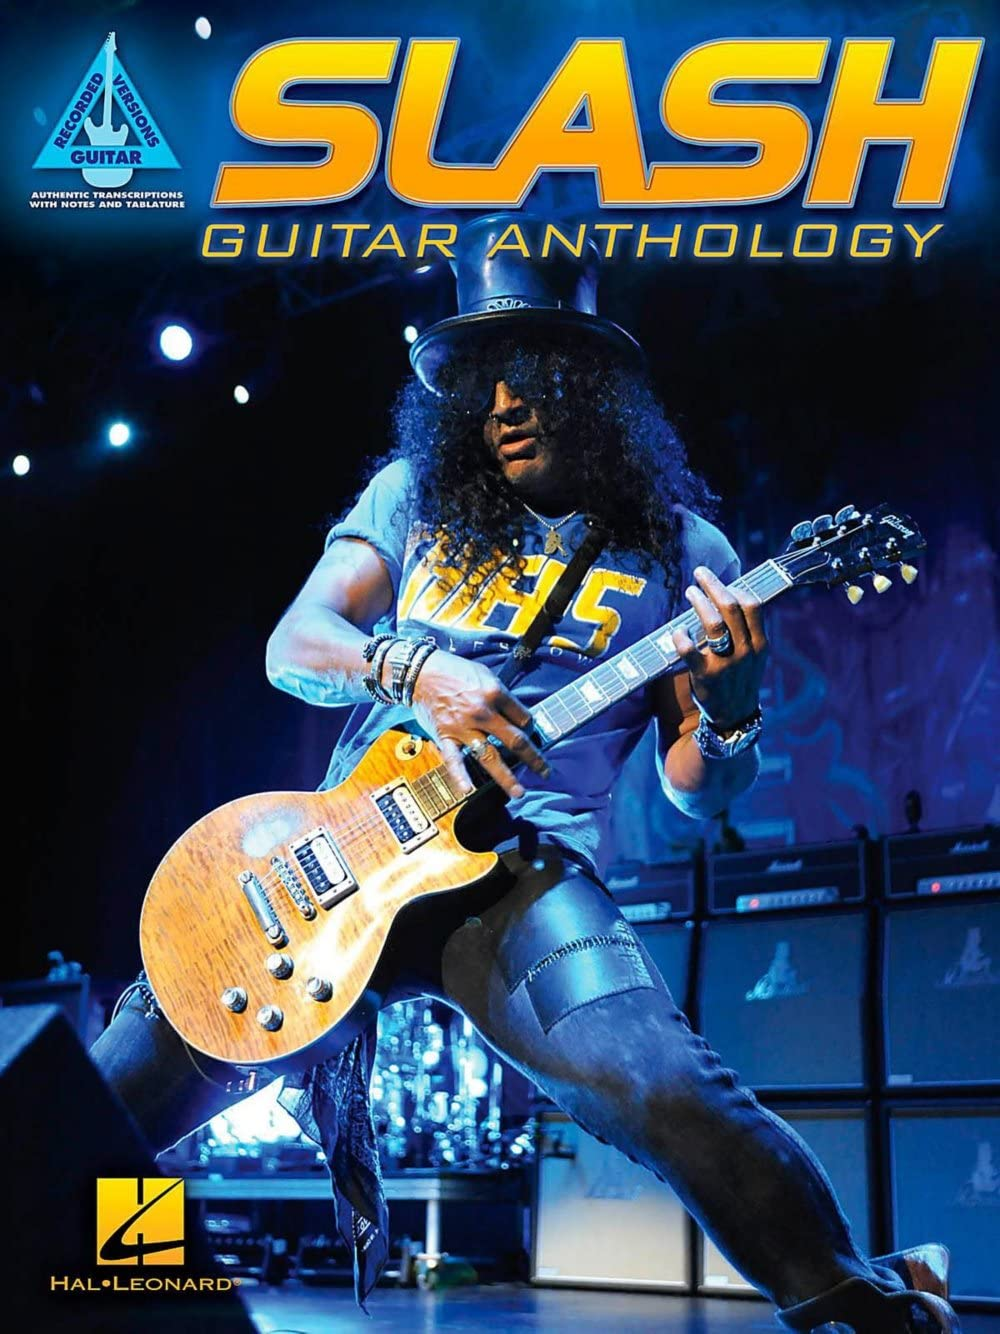 Hal Leonard Slash - Guitar Anthology Guitar Tab Songbook: Amazon ...